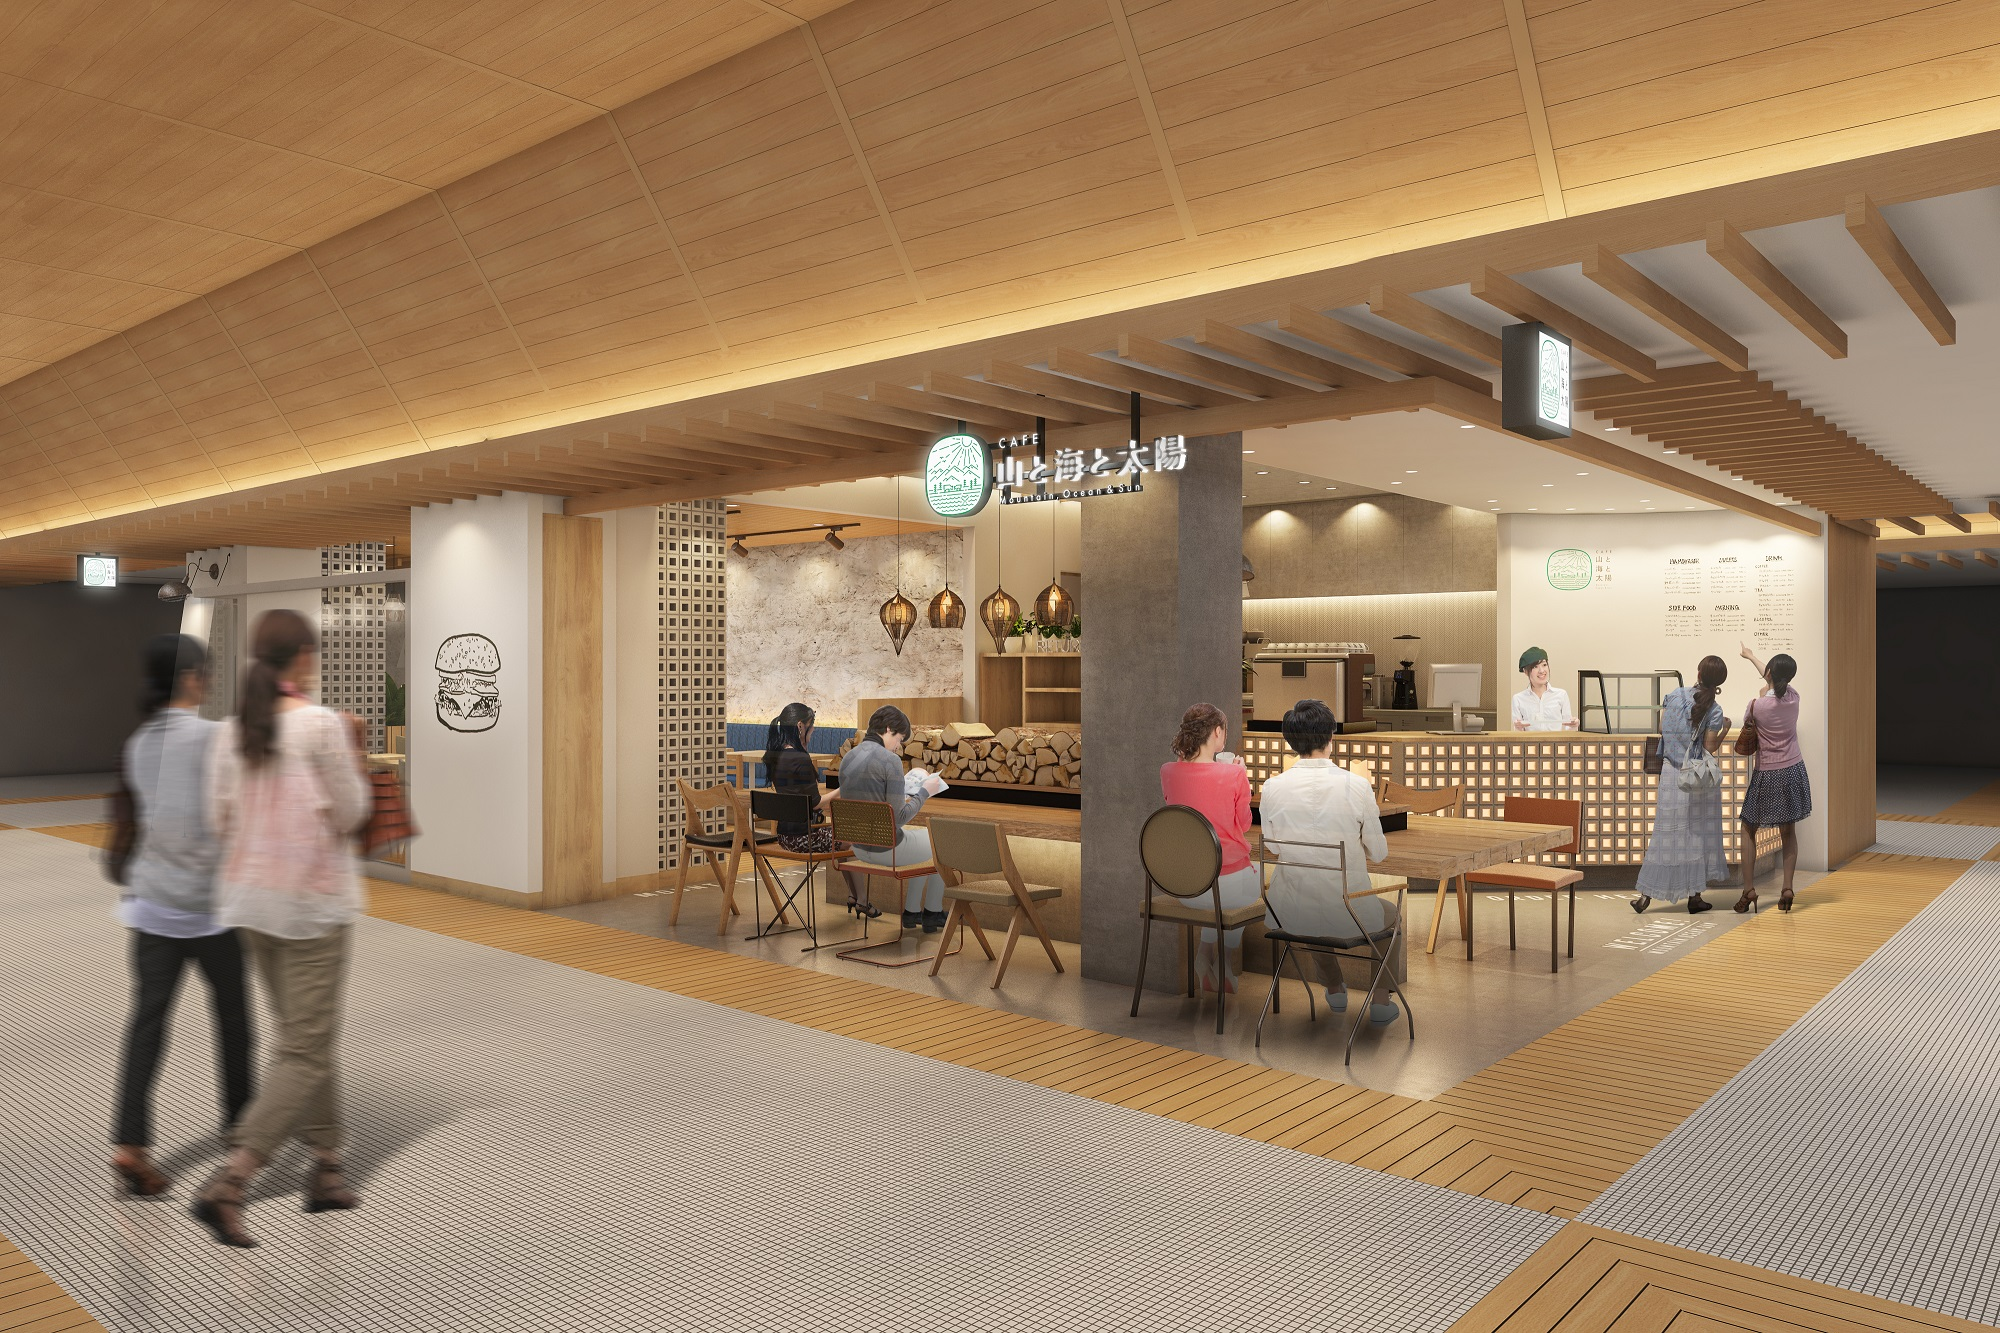 | SUSMCA(ススミカマガジン) | https://susmca.com/cafe-yama-to-umi-sizuoka-open/